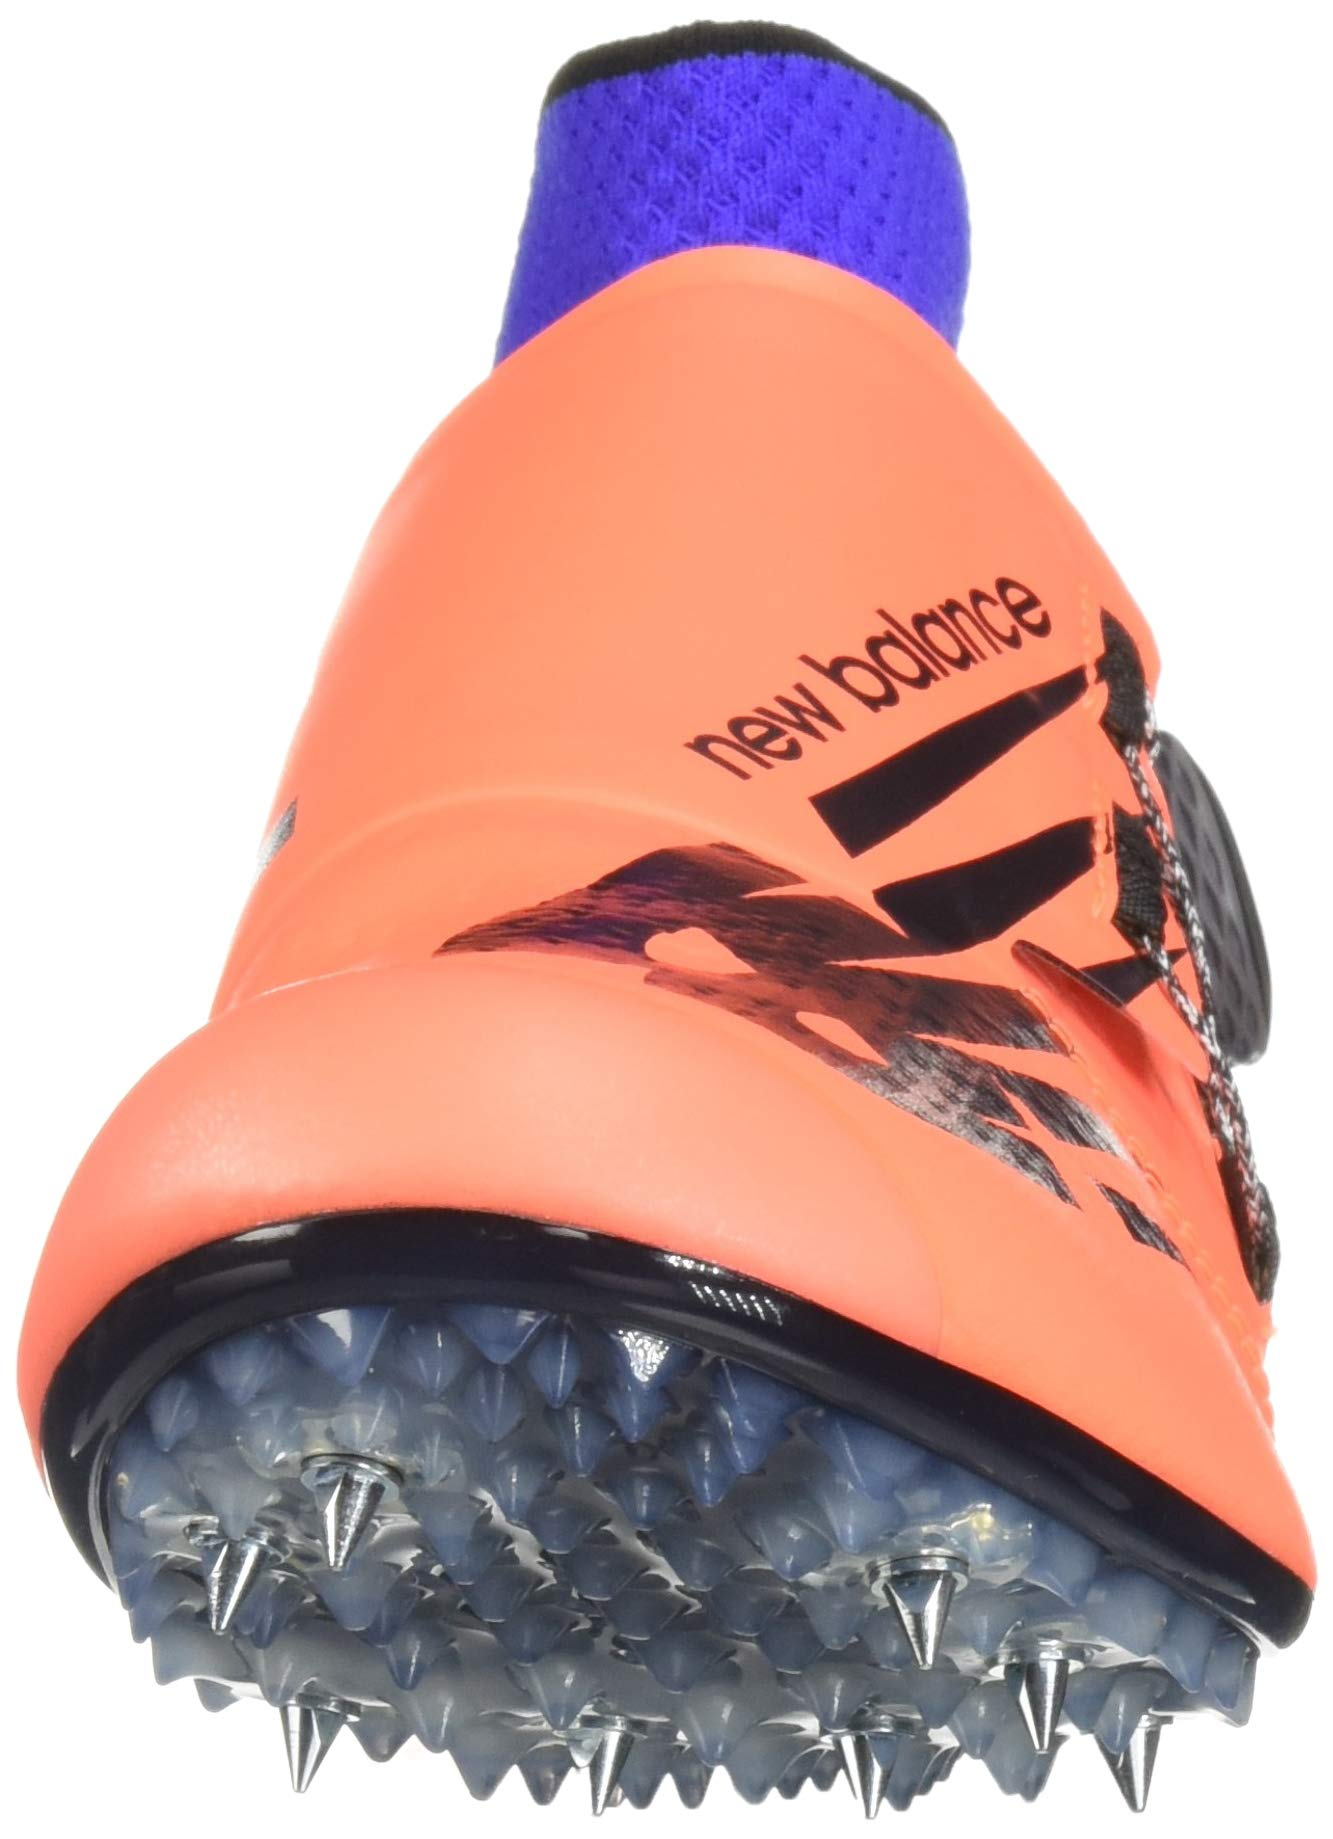 New Balance Men's Sigma Harmony Vazee Track Shoe Dark Mango/uv Blue 5 D US by New Balance (Image #4)